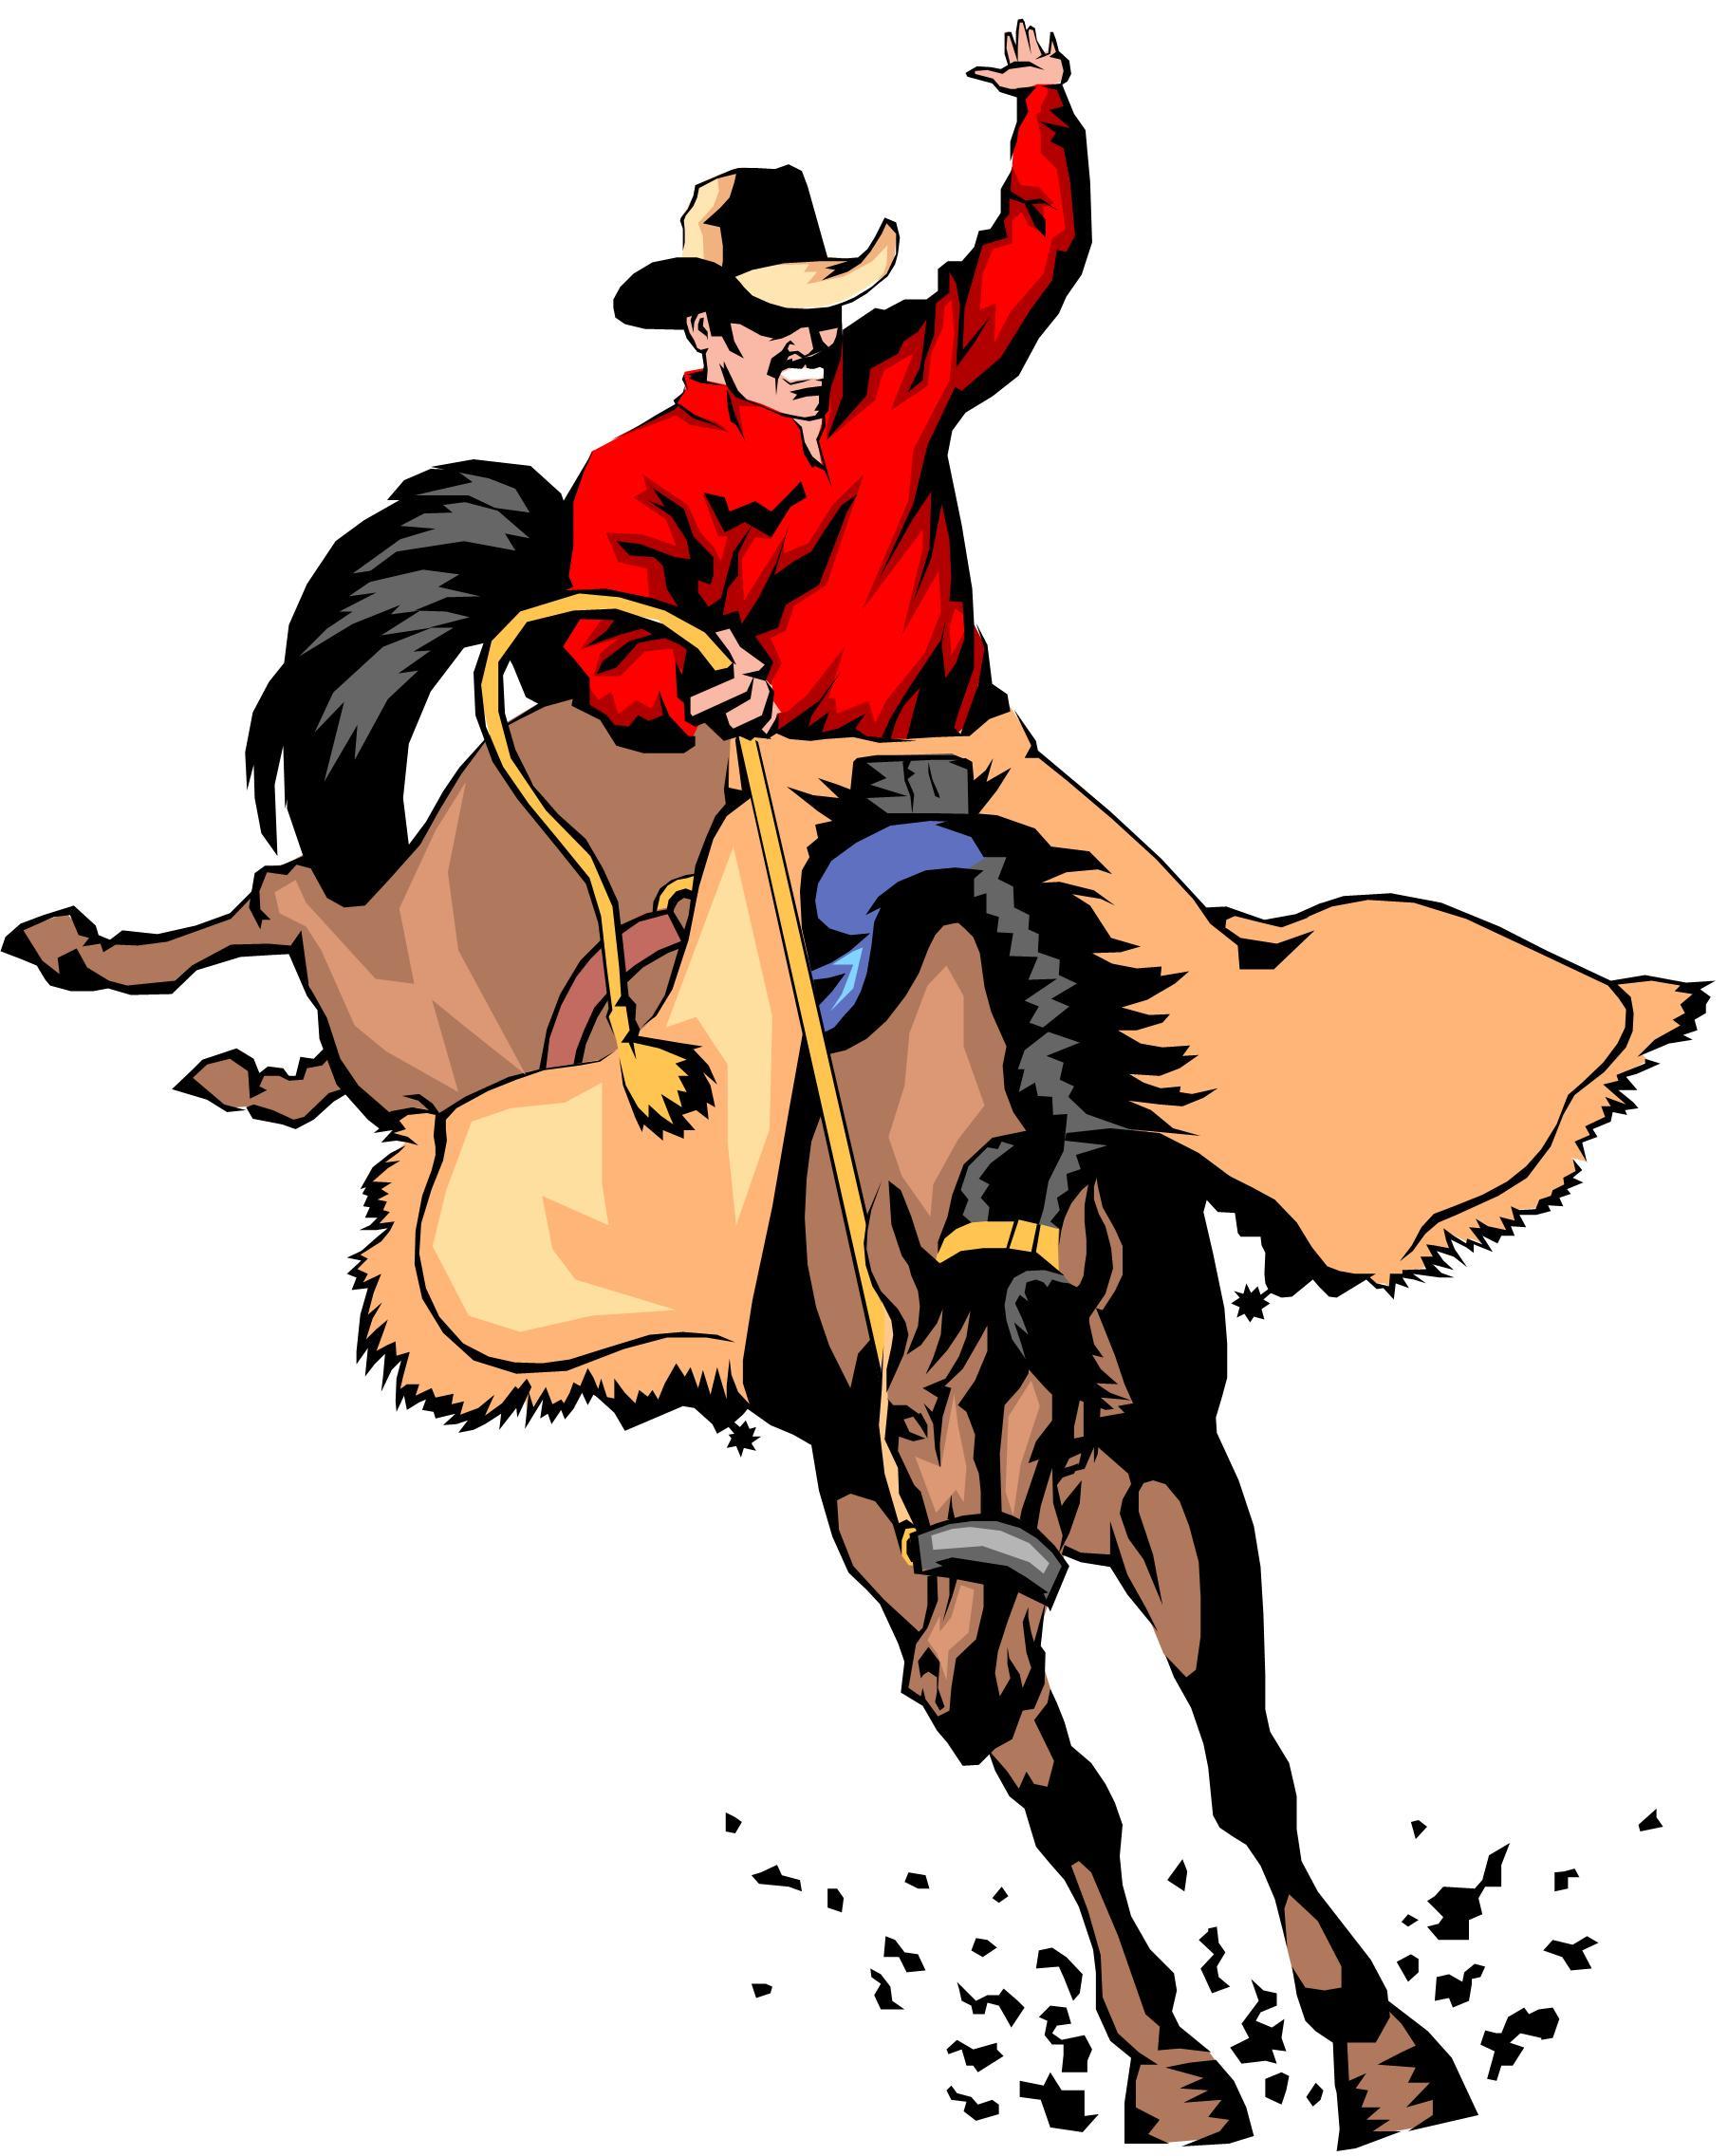 ковбой джо ловил мустангов он кинул 18 раз